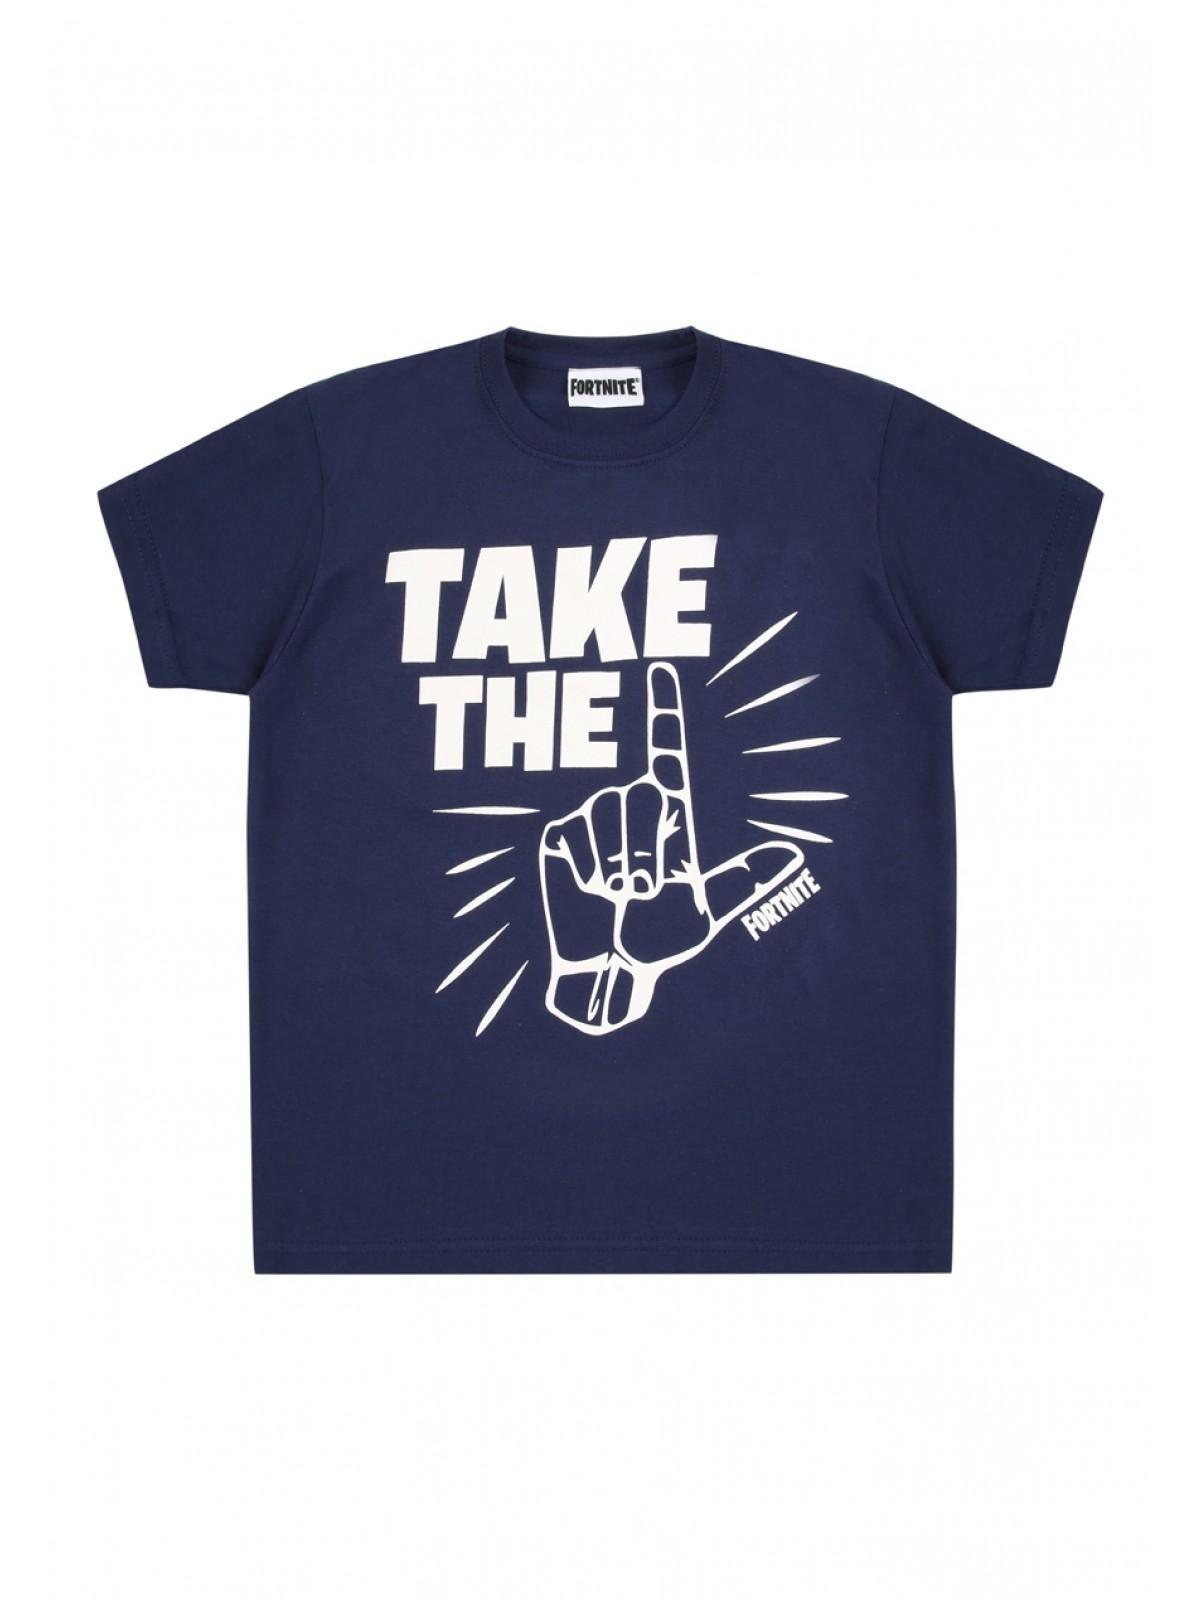 c3e3d6e45 Home; Older Boys Navy Fortnite Take The L Slogan T-shirt. Back. PreviousNext